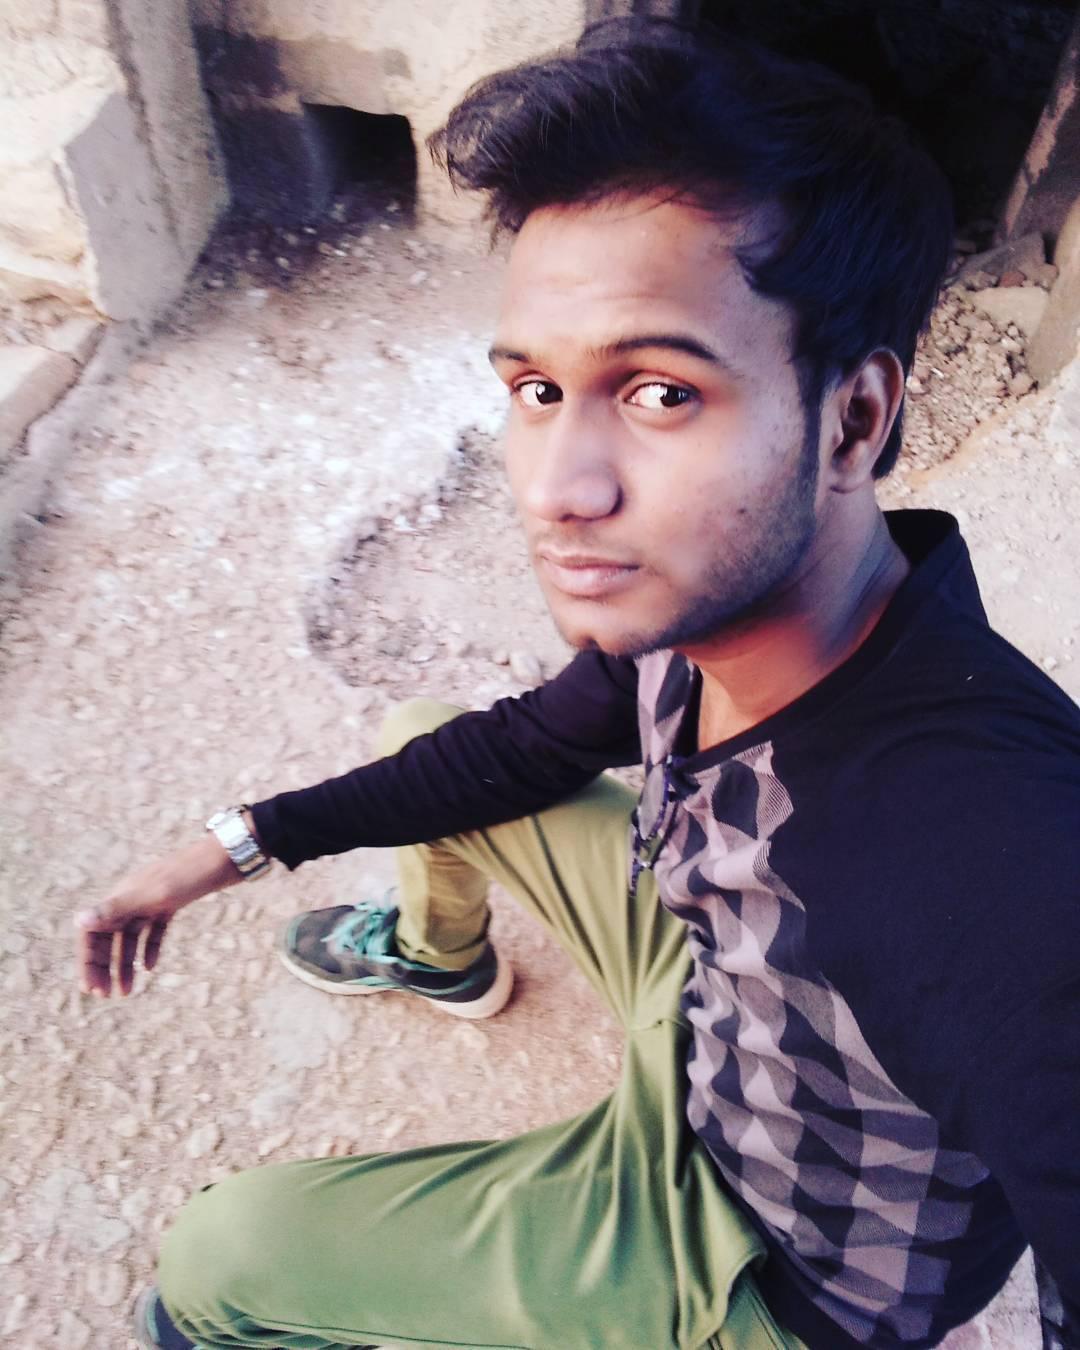 arjun20111996